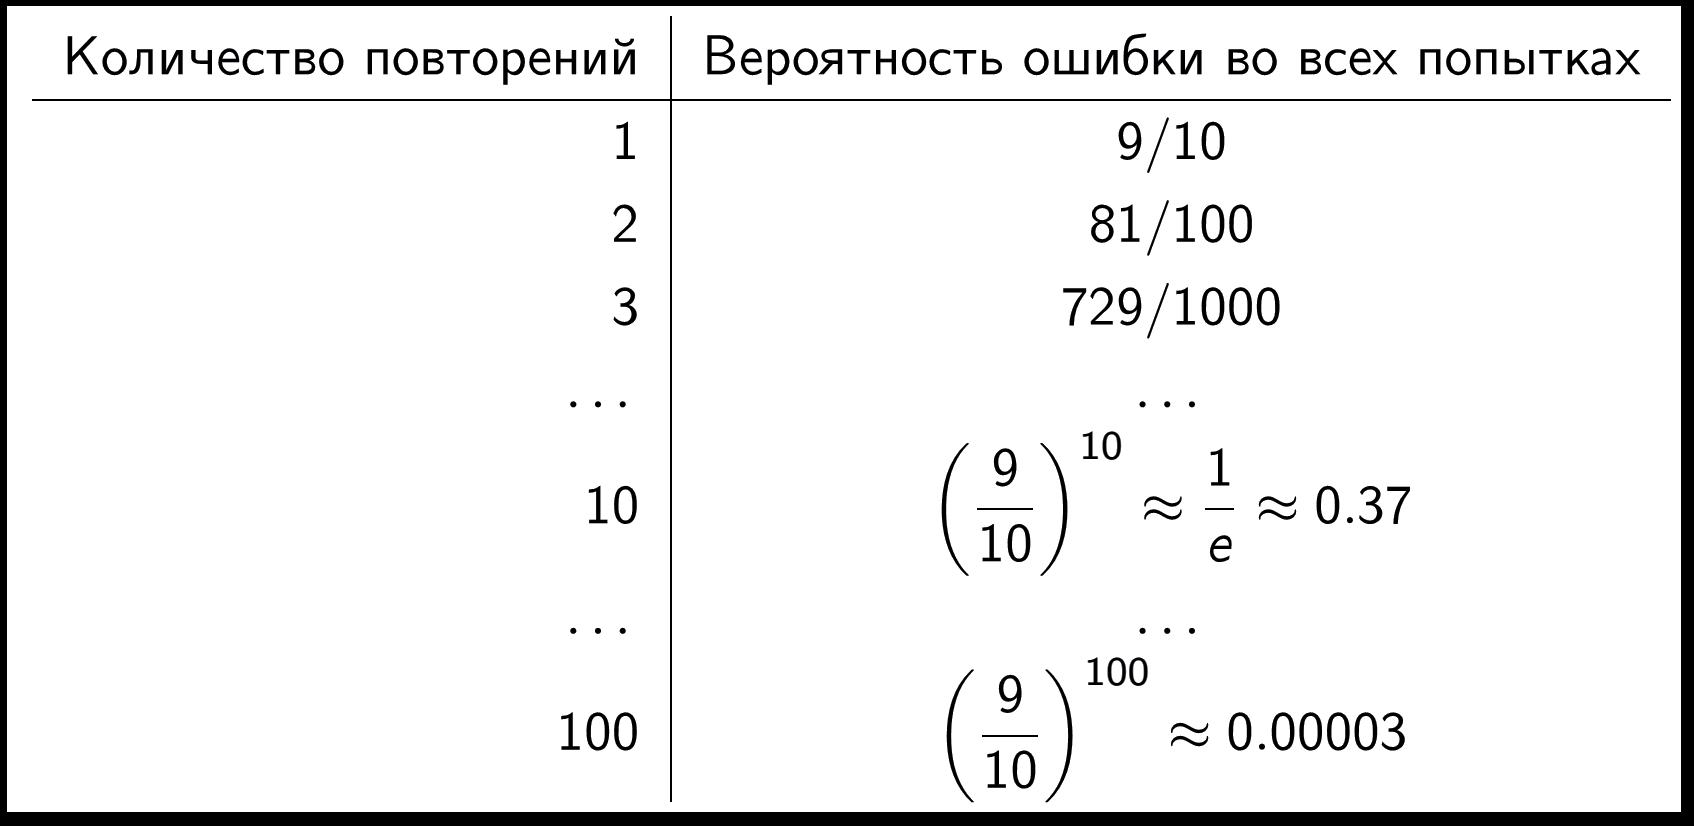 инструкция в виде алгоритма